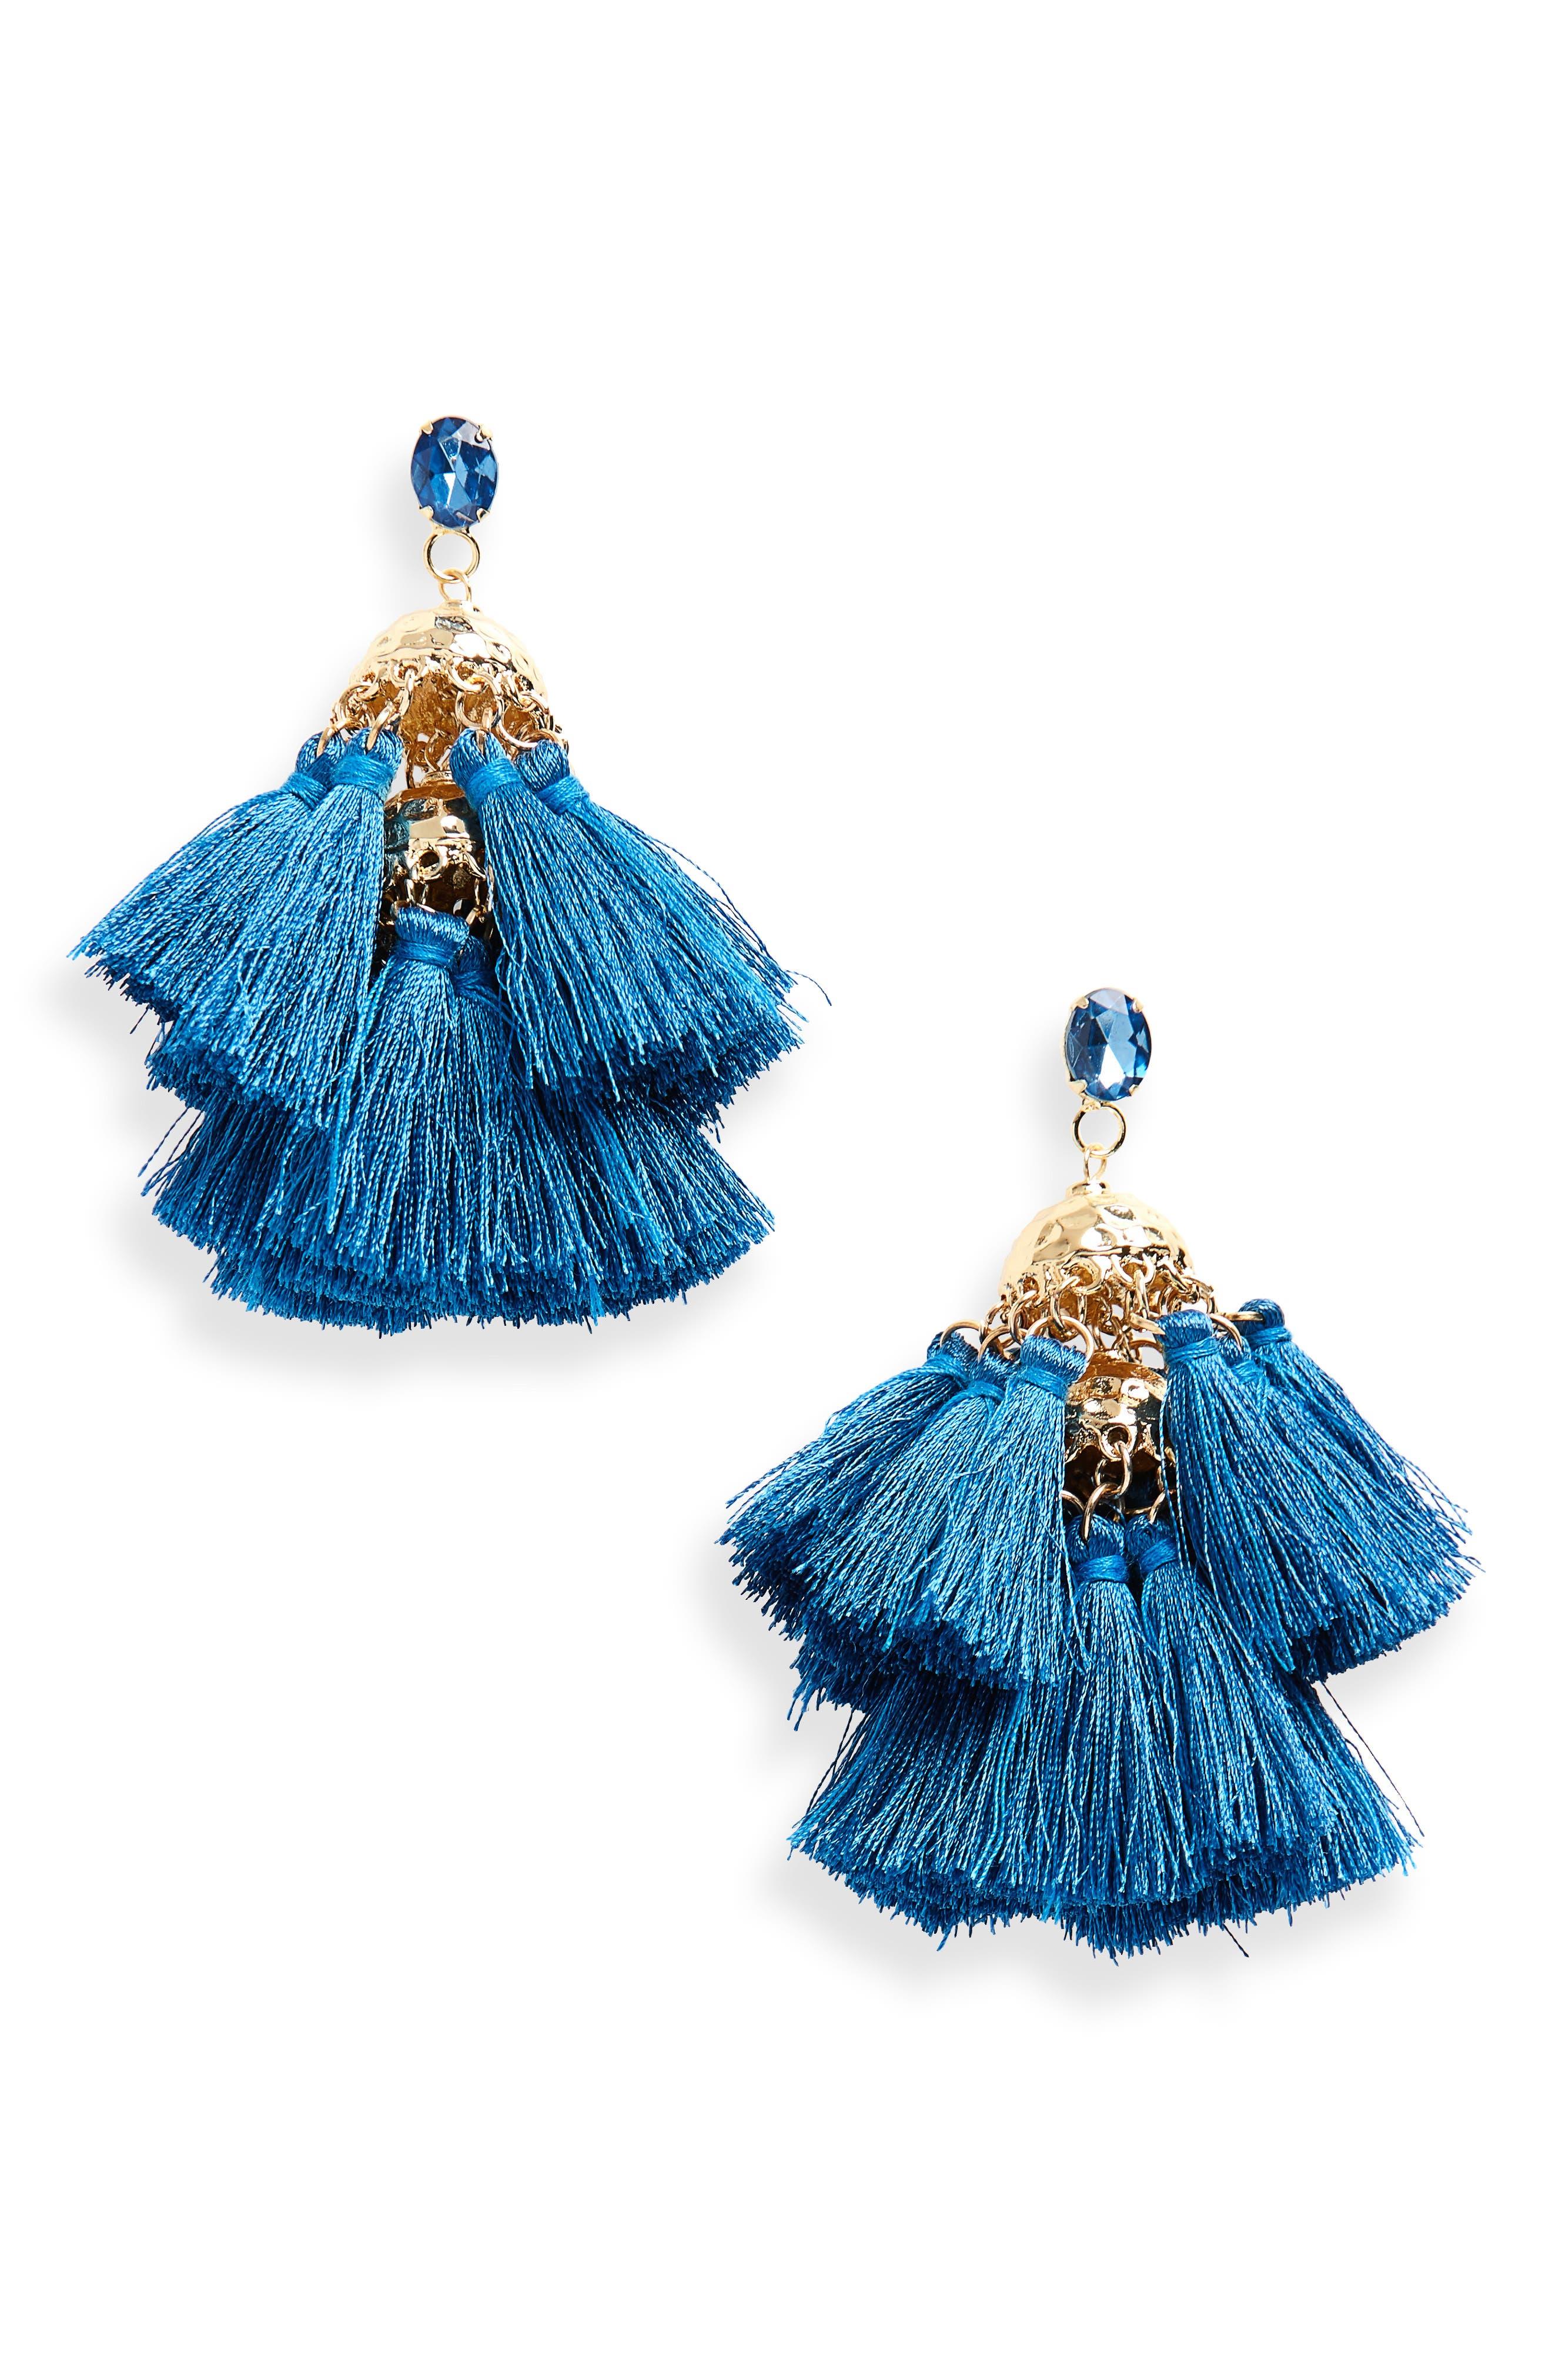 Hammered Charm & Tassel Earrings,                             Main thumbnail 1, color,                             Gold/ Blue